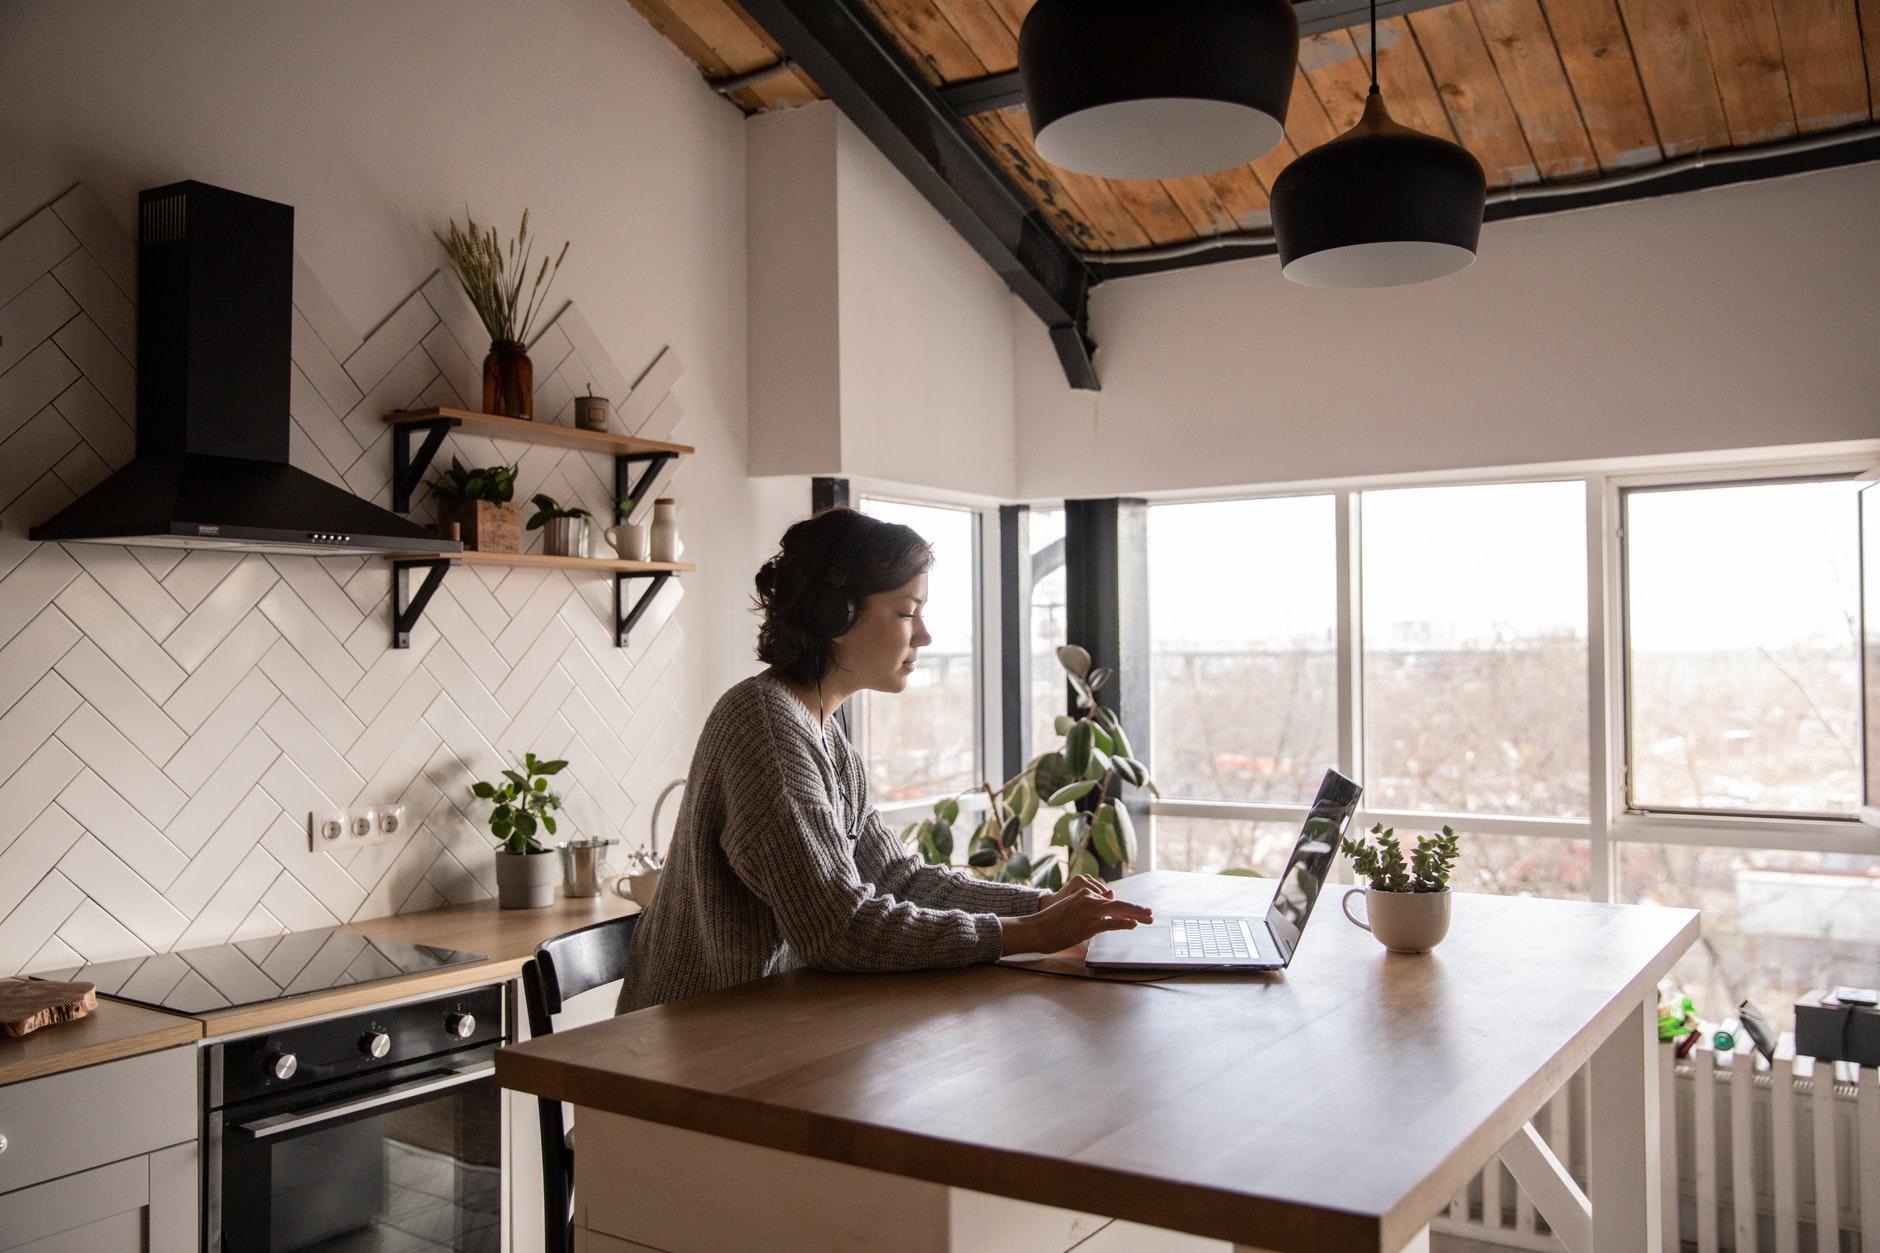 kuchyna-s-ostrovcekom-velky-oknom-ciernym-digestorom-zena-pracuje-v-kuchyni-s-notebookom